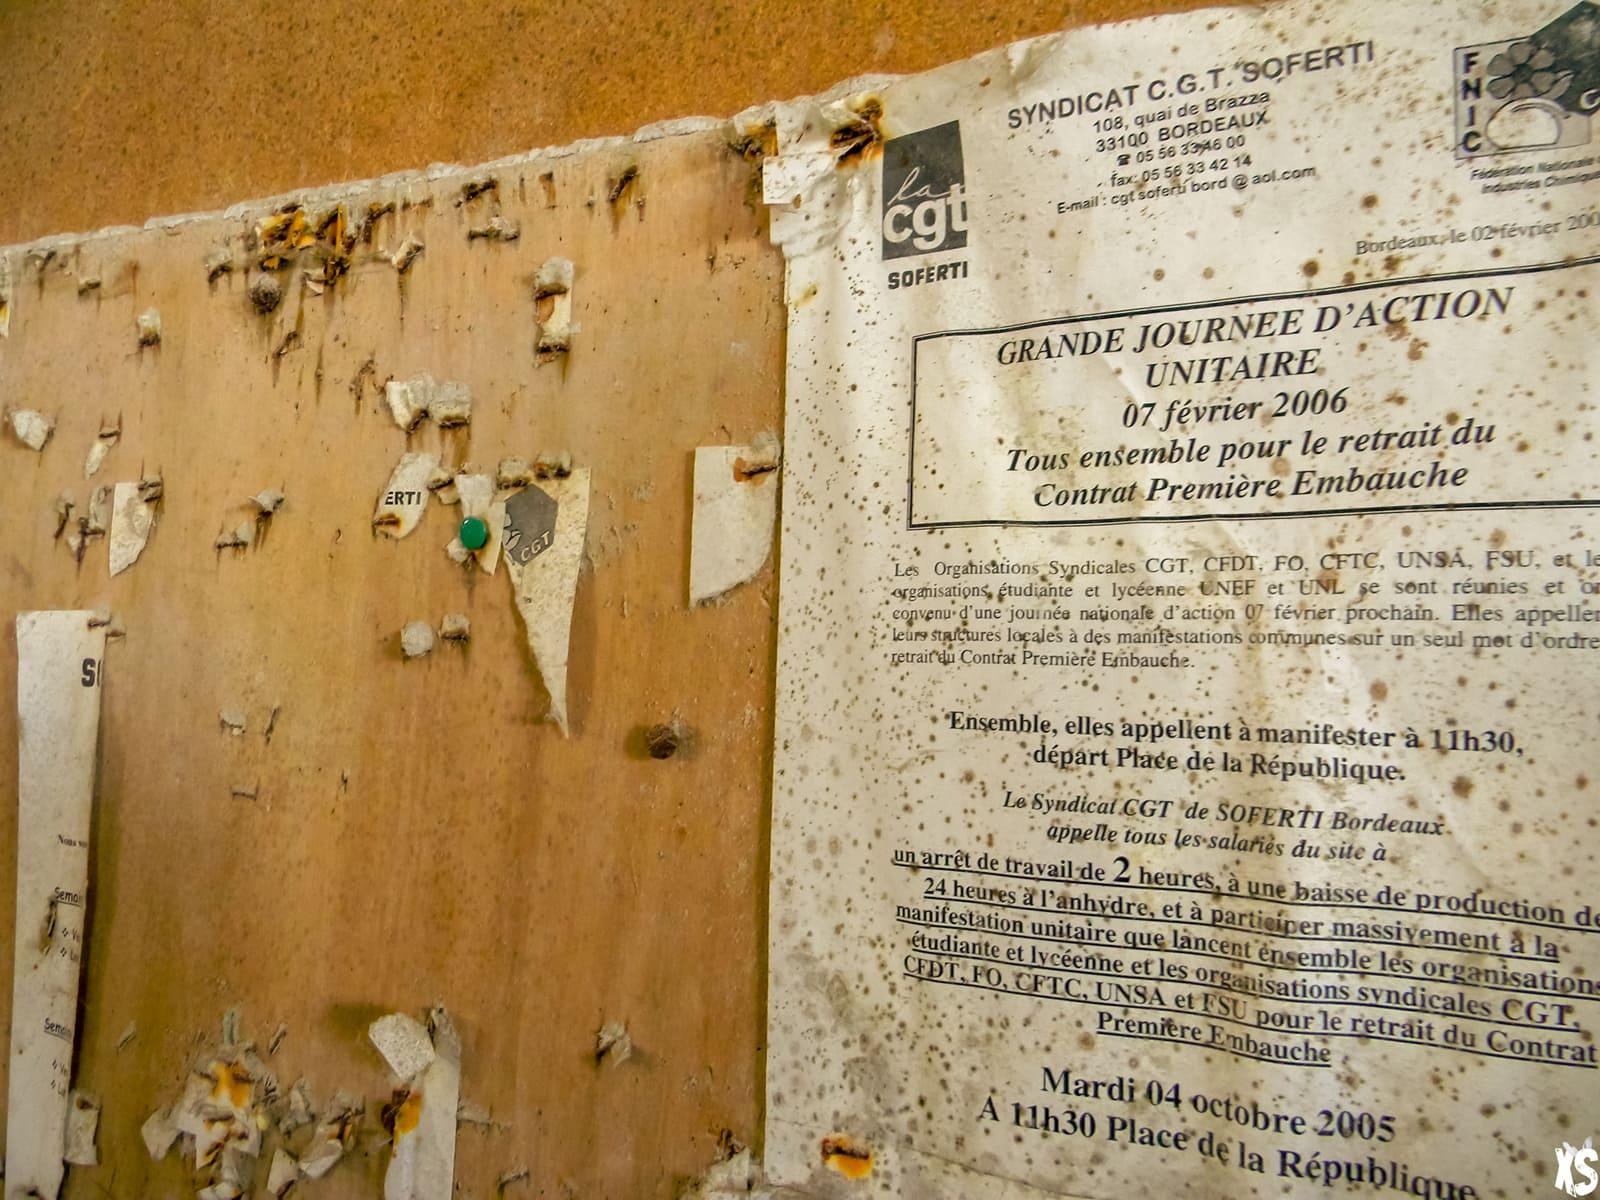 Usine Soferti située à Bordeaux | urbexsession.com/soferti-bordeaux | Urbex Bordeaux